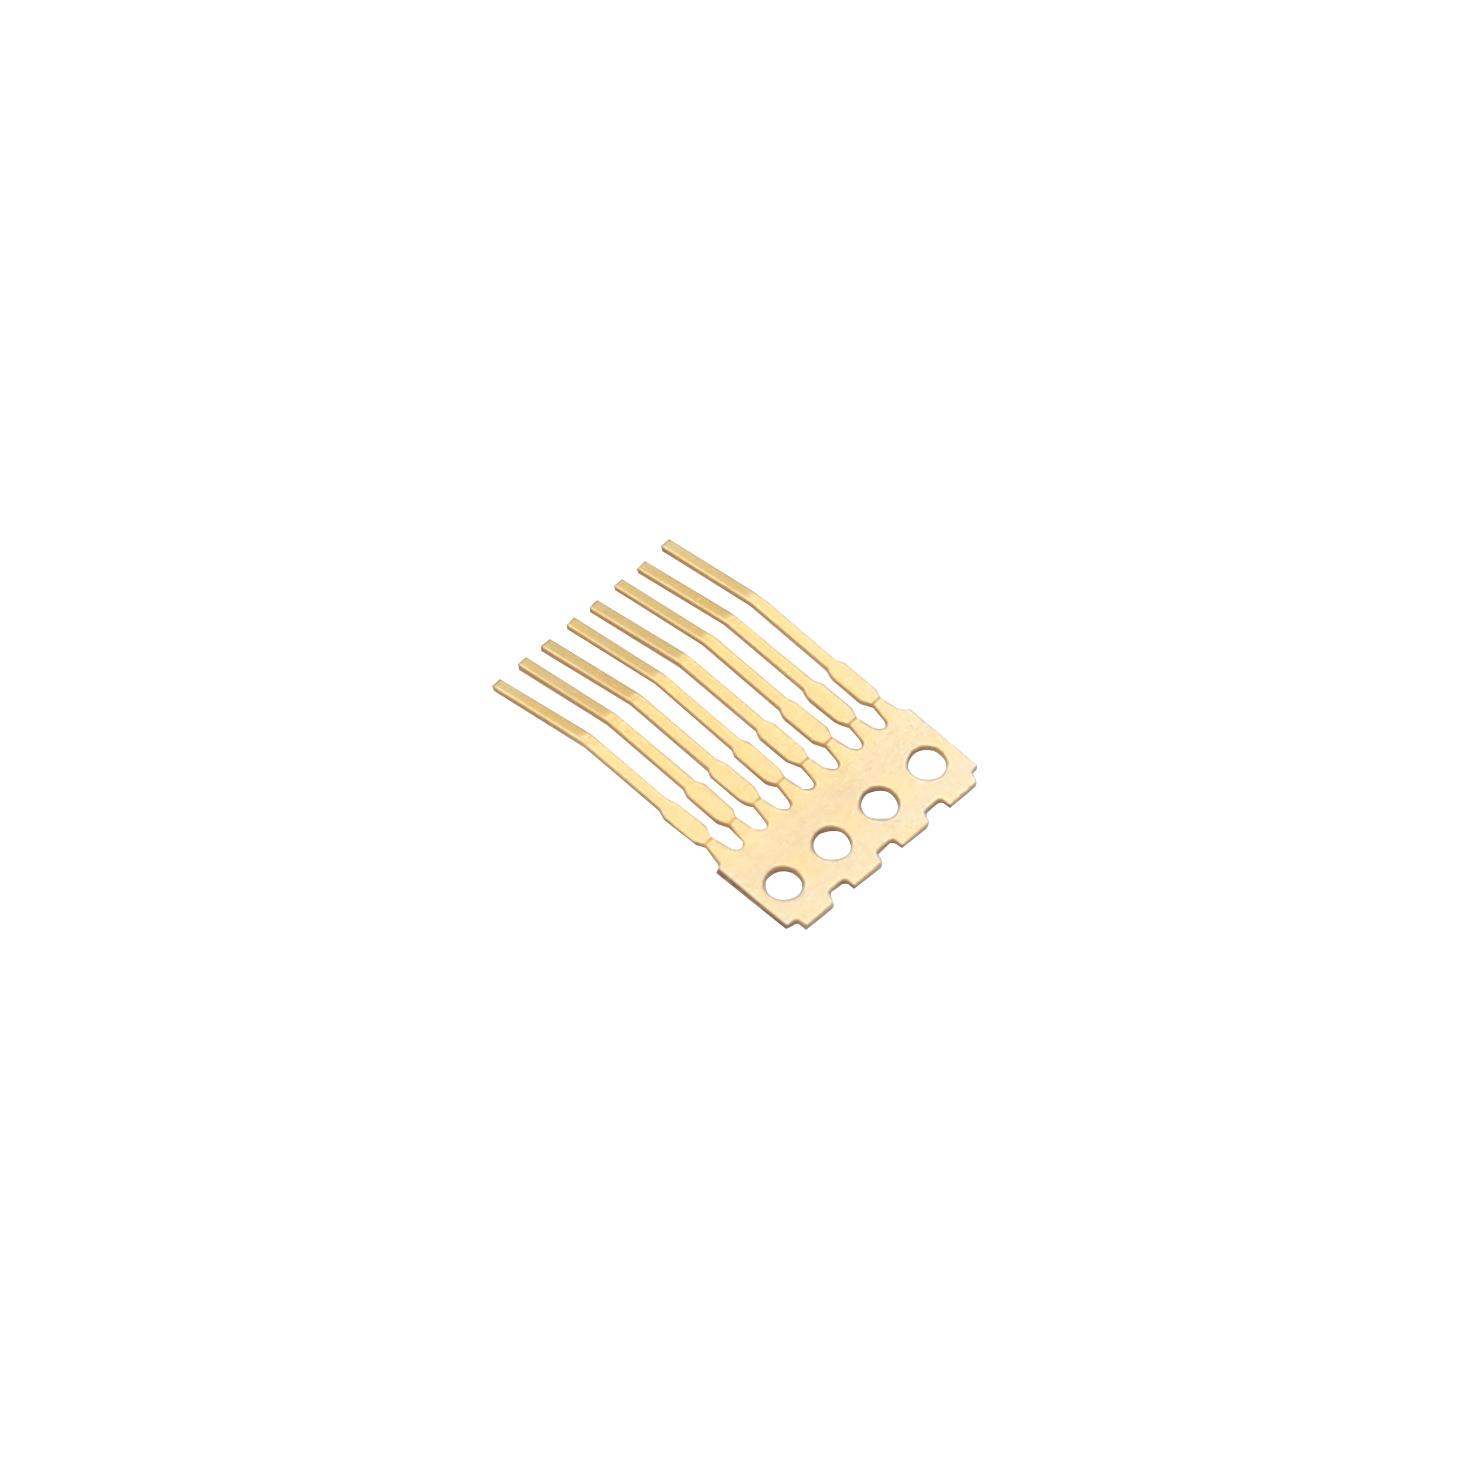 0.4x8.6鈹銅PIN針志盈端子ZYT